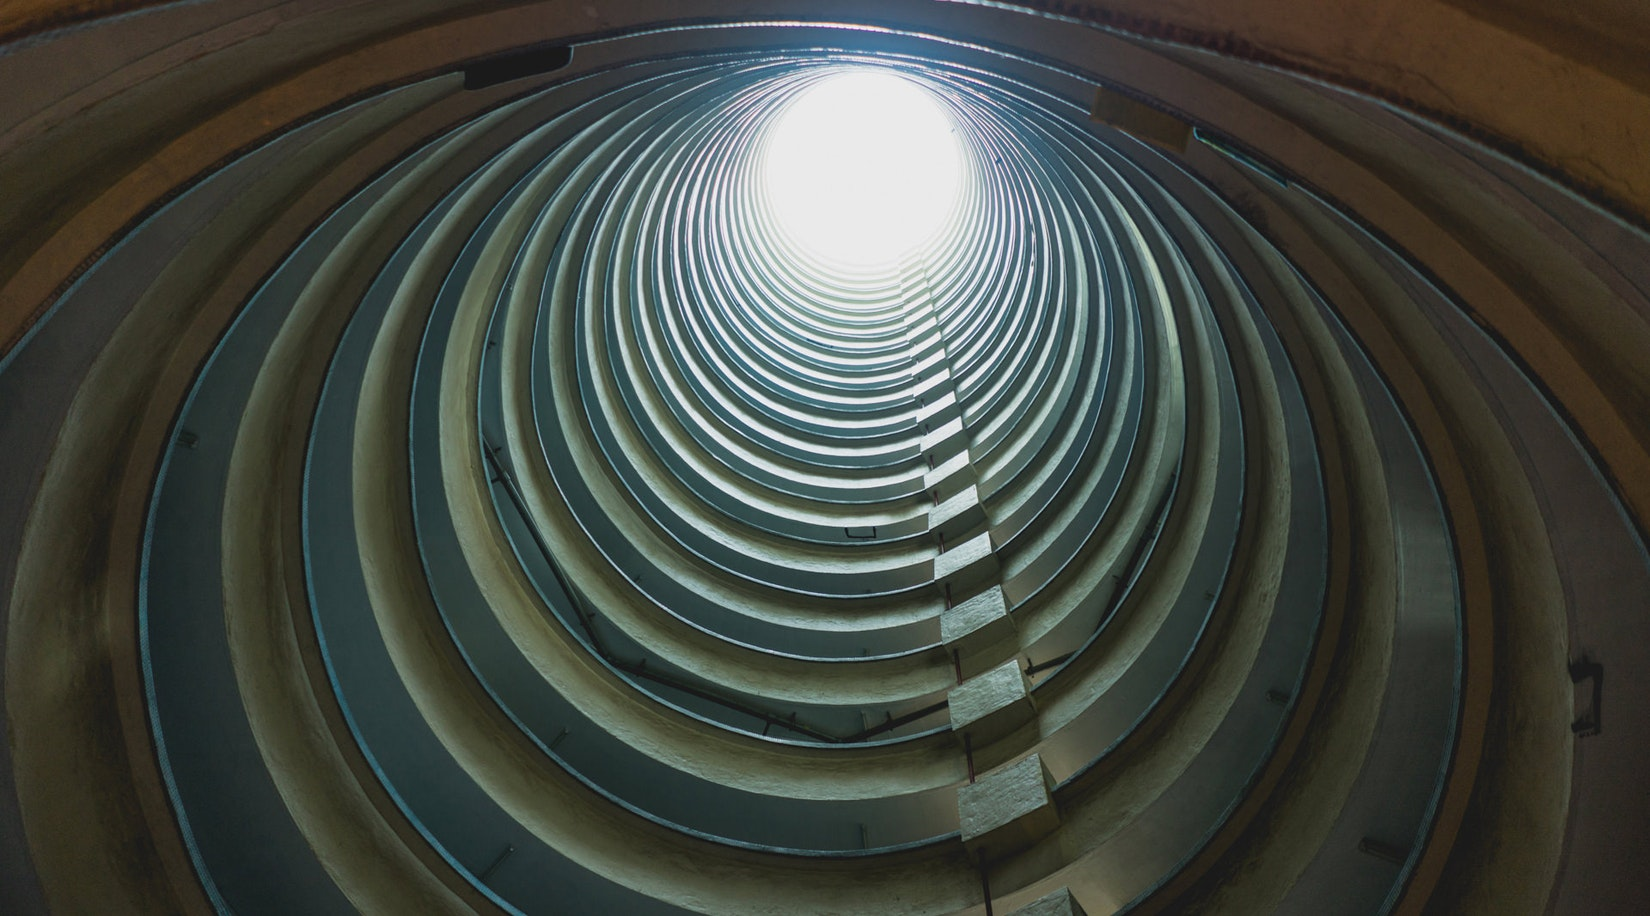 Hong Kong image from Lai Tak Tsuen